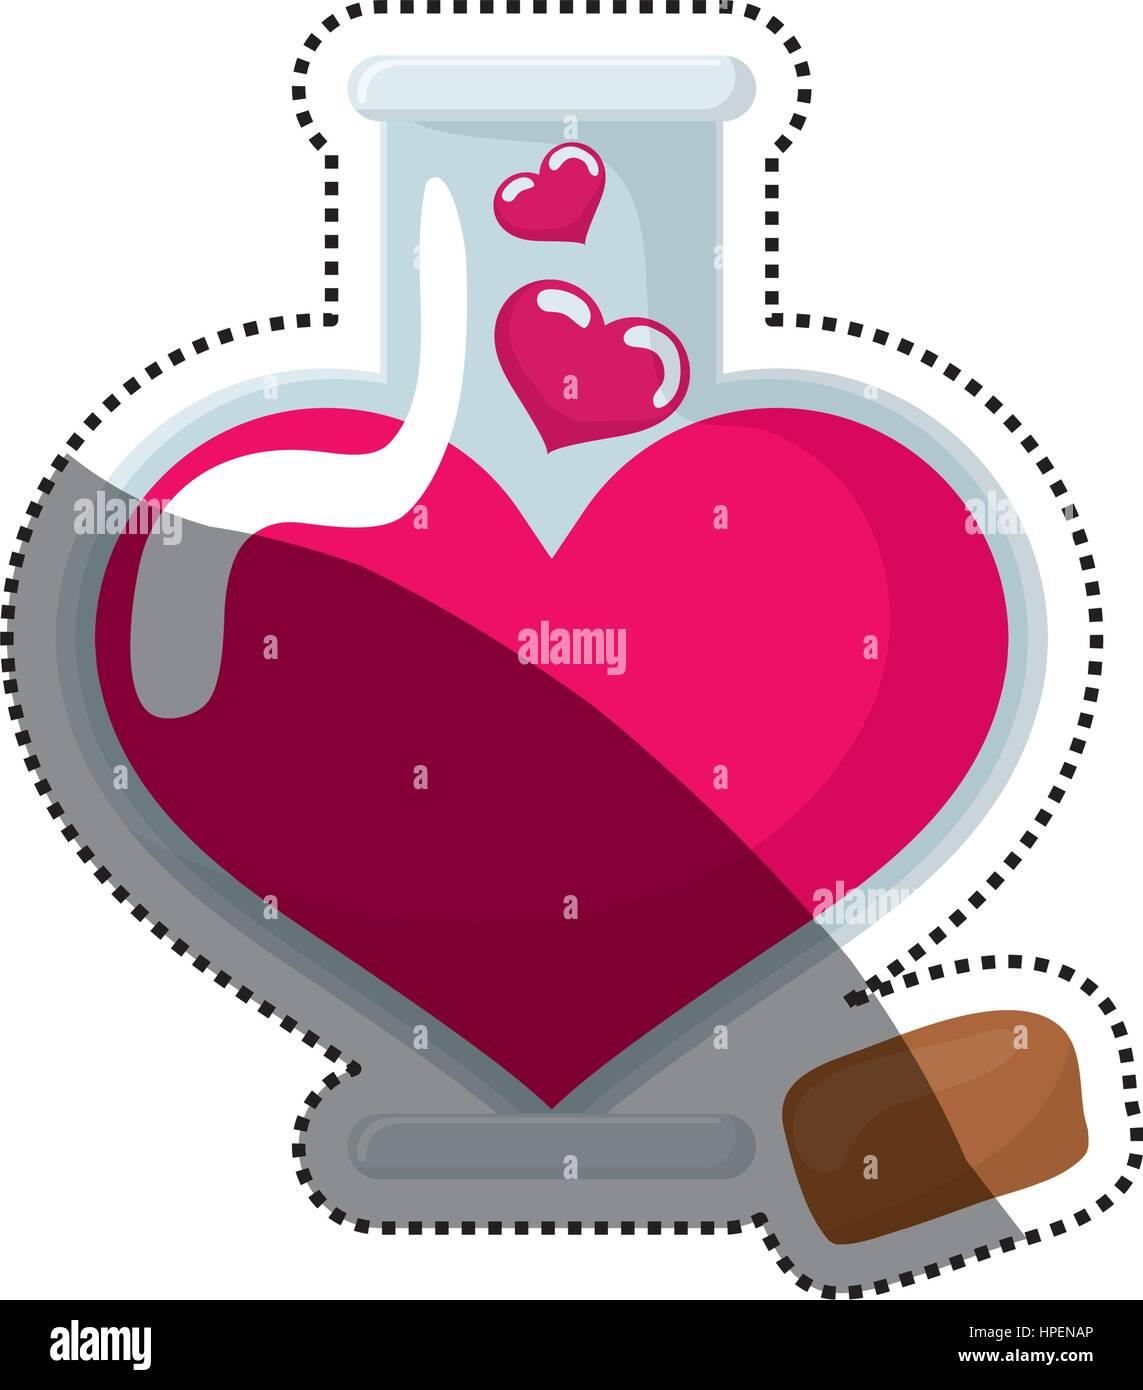 Liebe und Romantik Stockbild